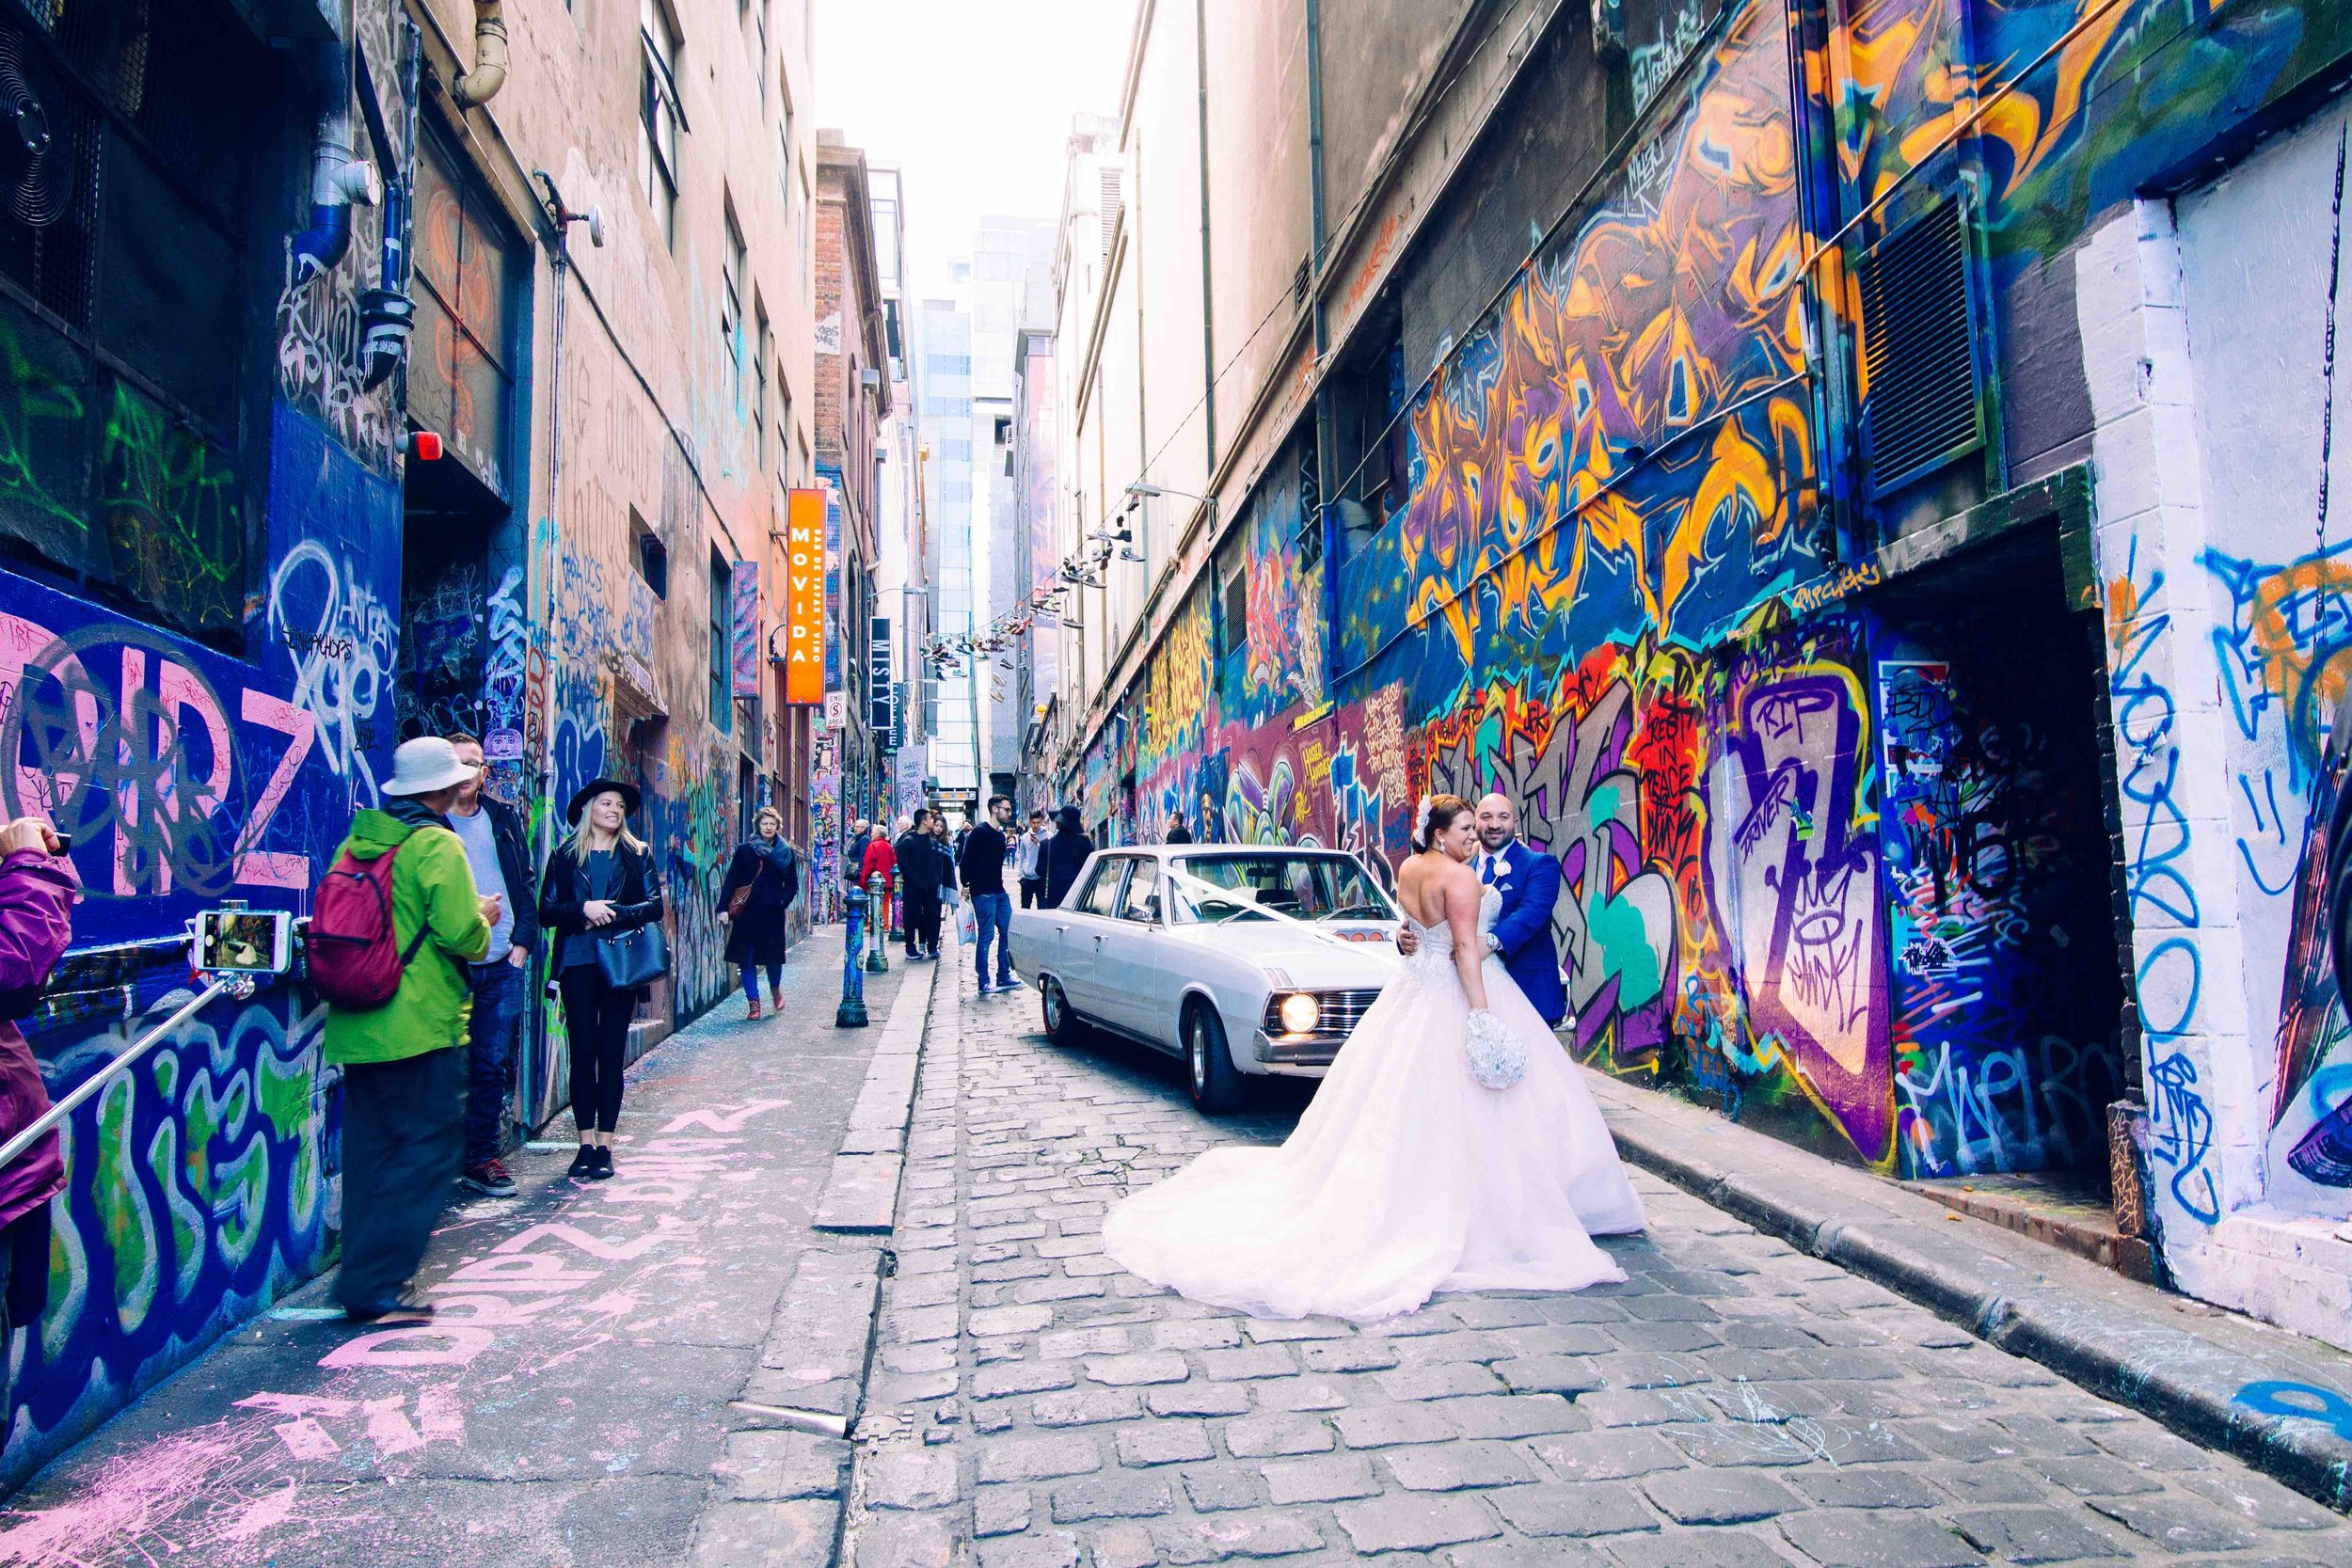 Hosier Lane in Melbourne. Photo: Marine Raynard